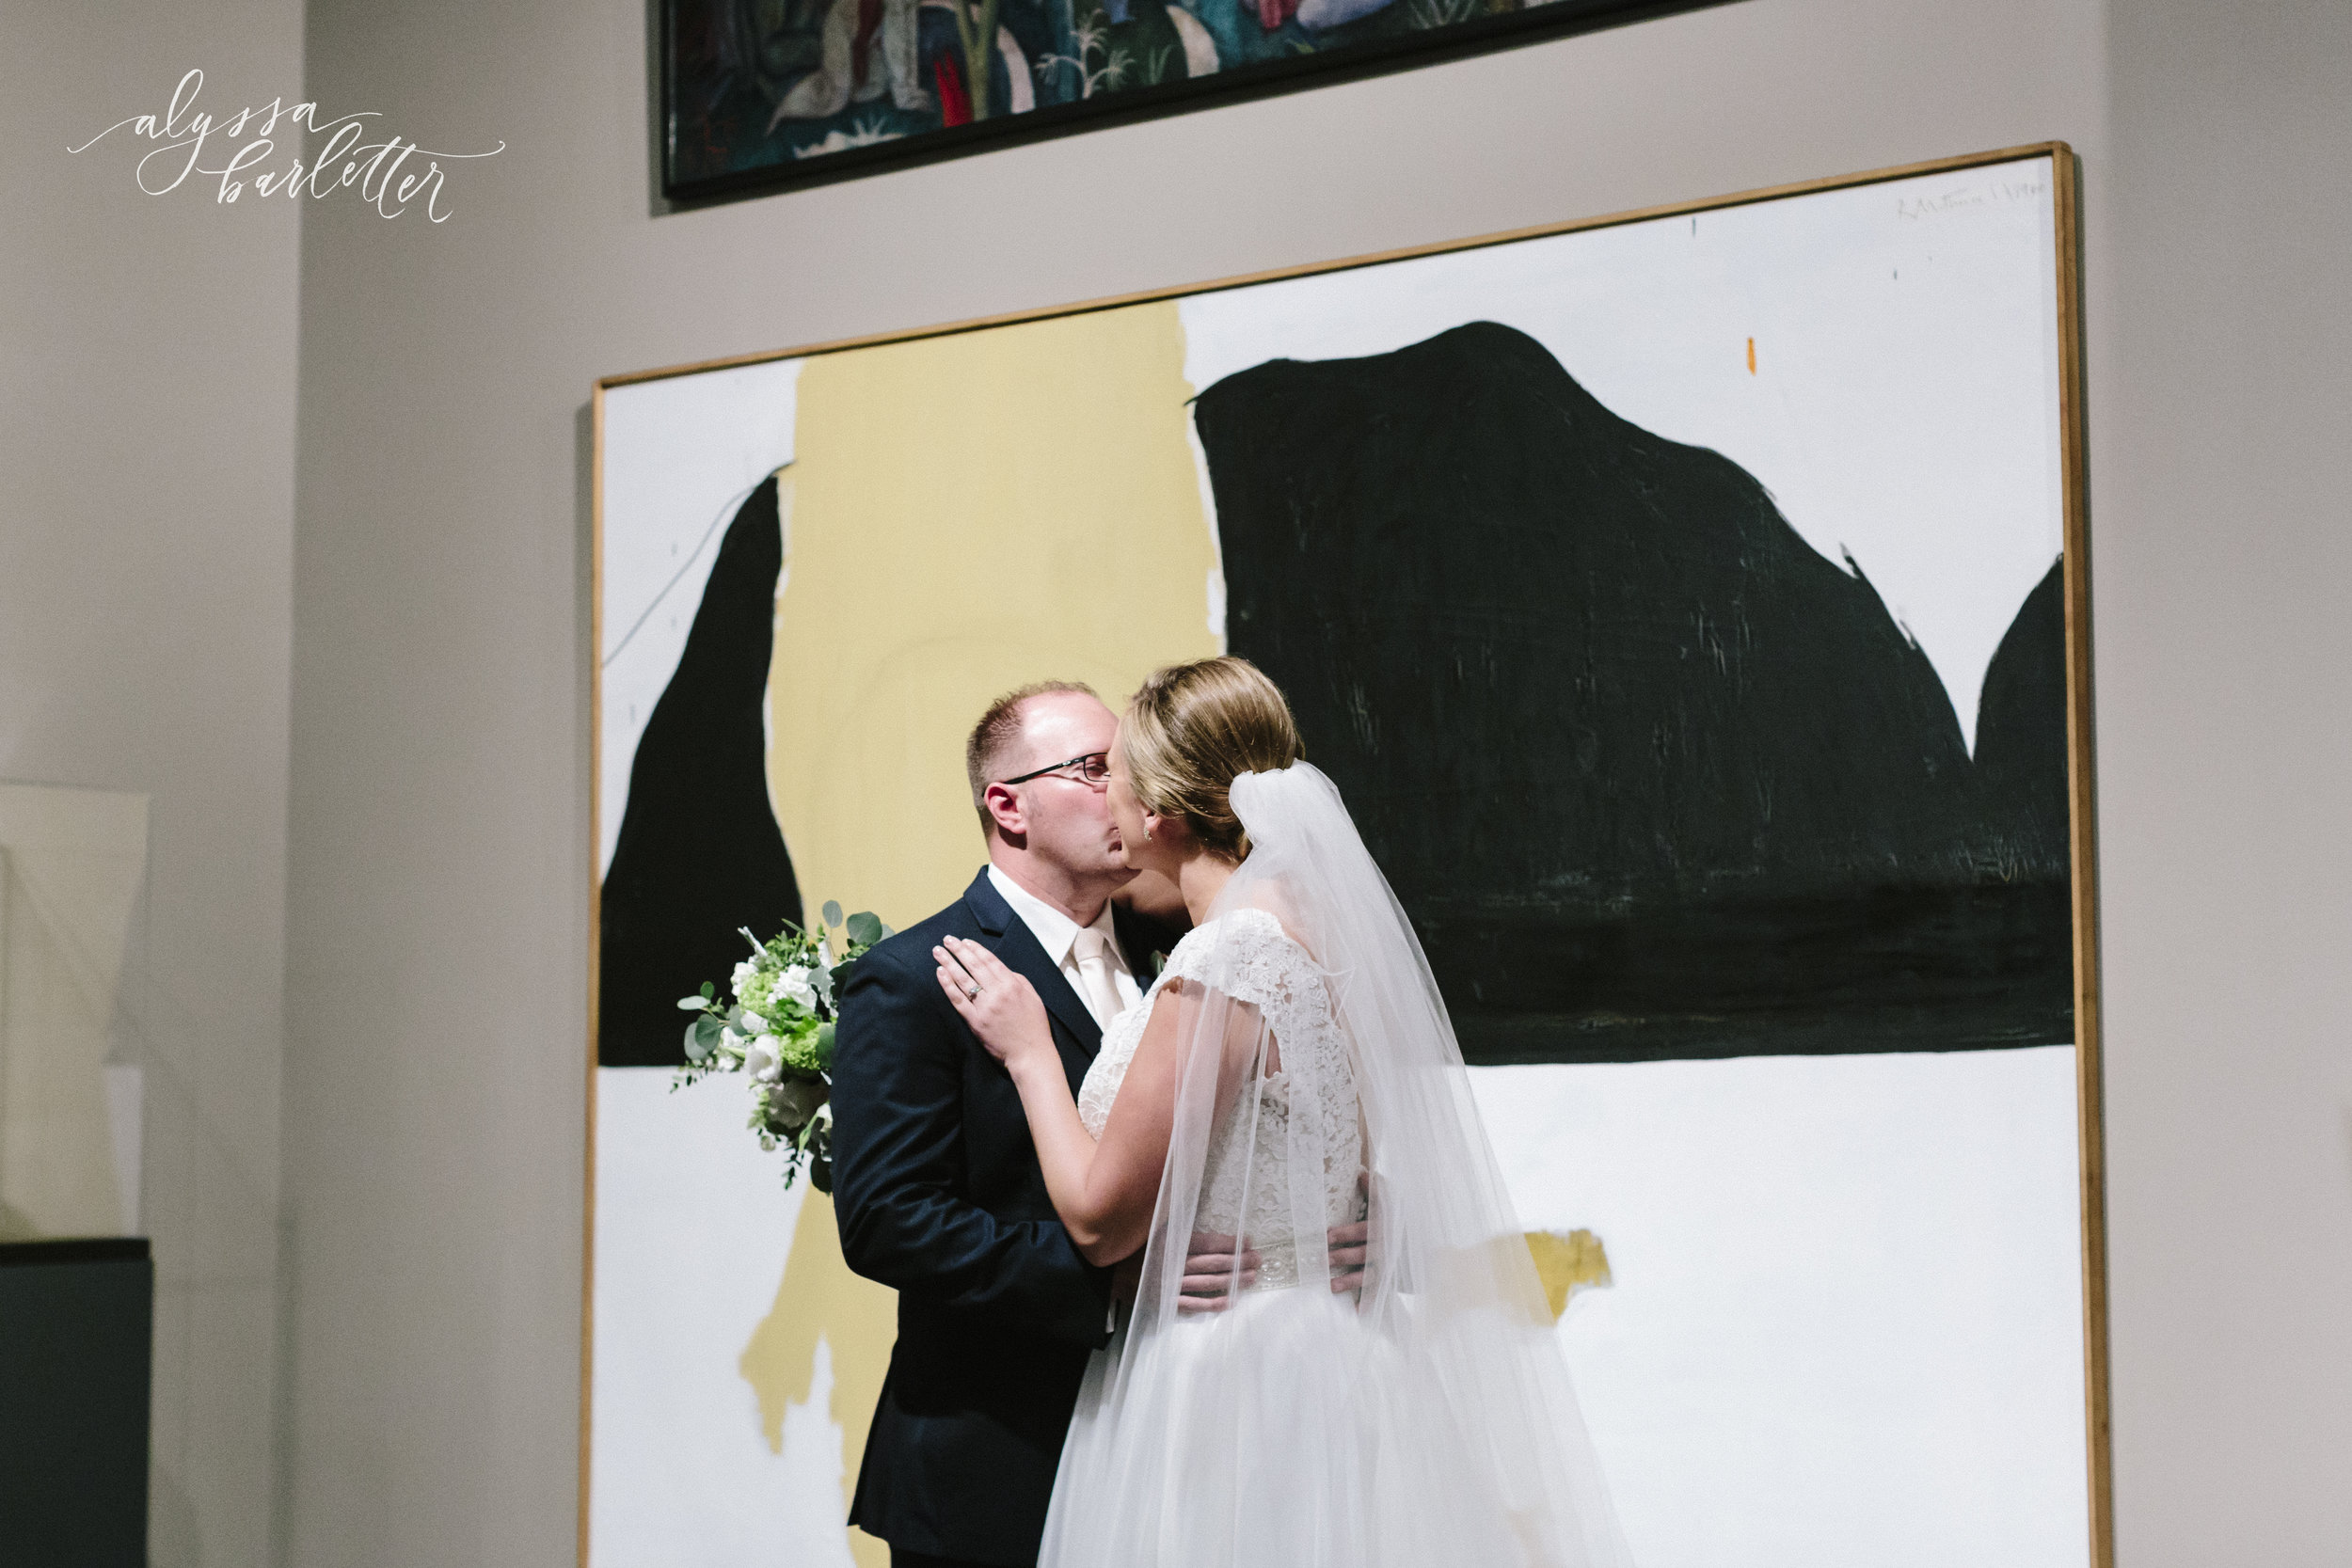 alyssa barletter photography cider gallery lawrence kansas rainy day wedding megan and brett-1-26.jpg